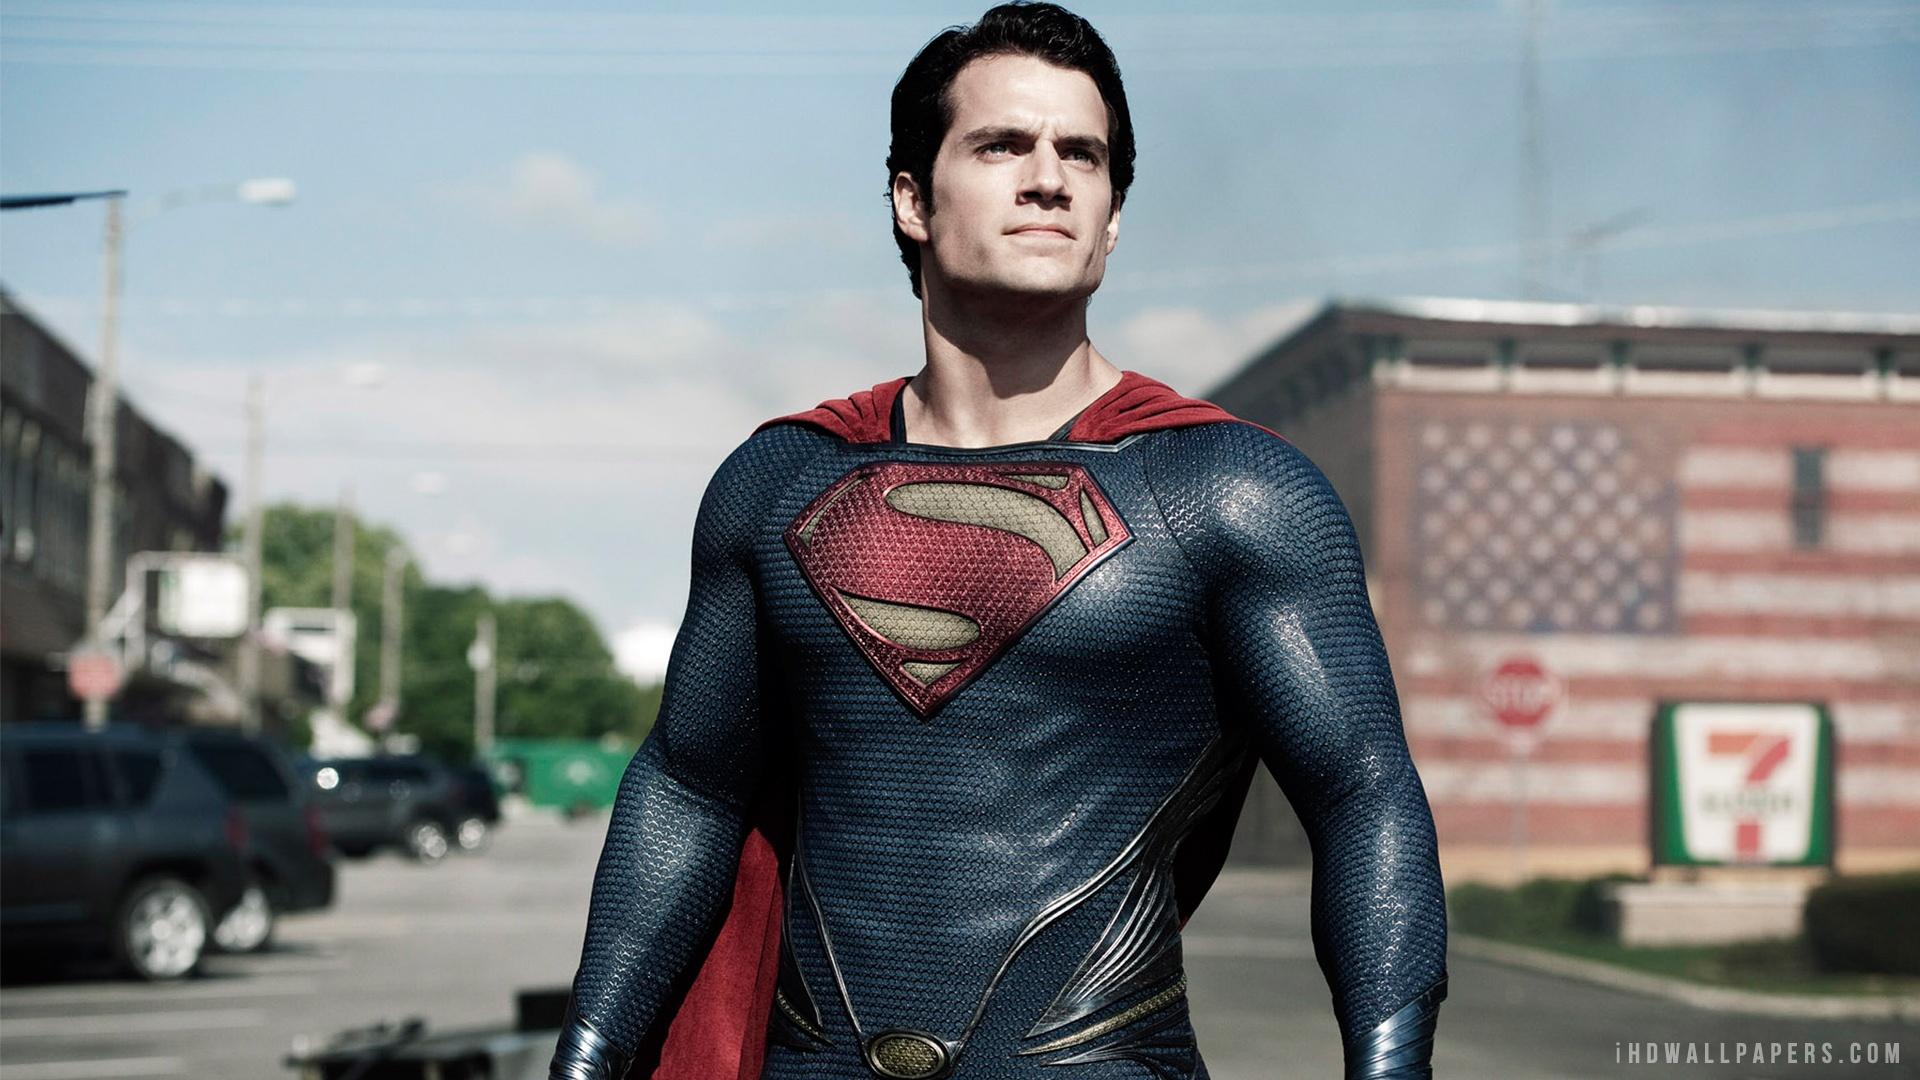 Henry Cavill as Superman HD Wallpaper   iHD Wallpapers 1920x1080